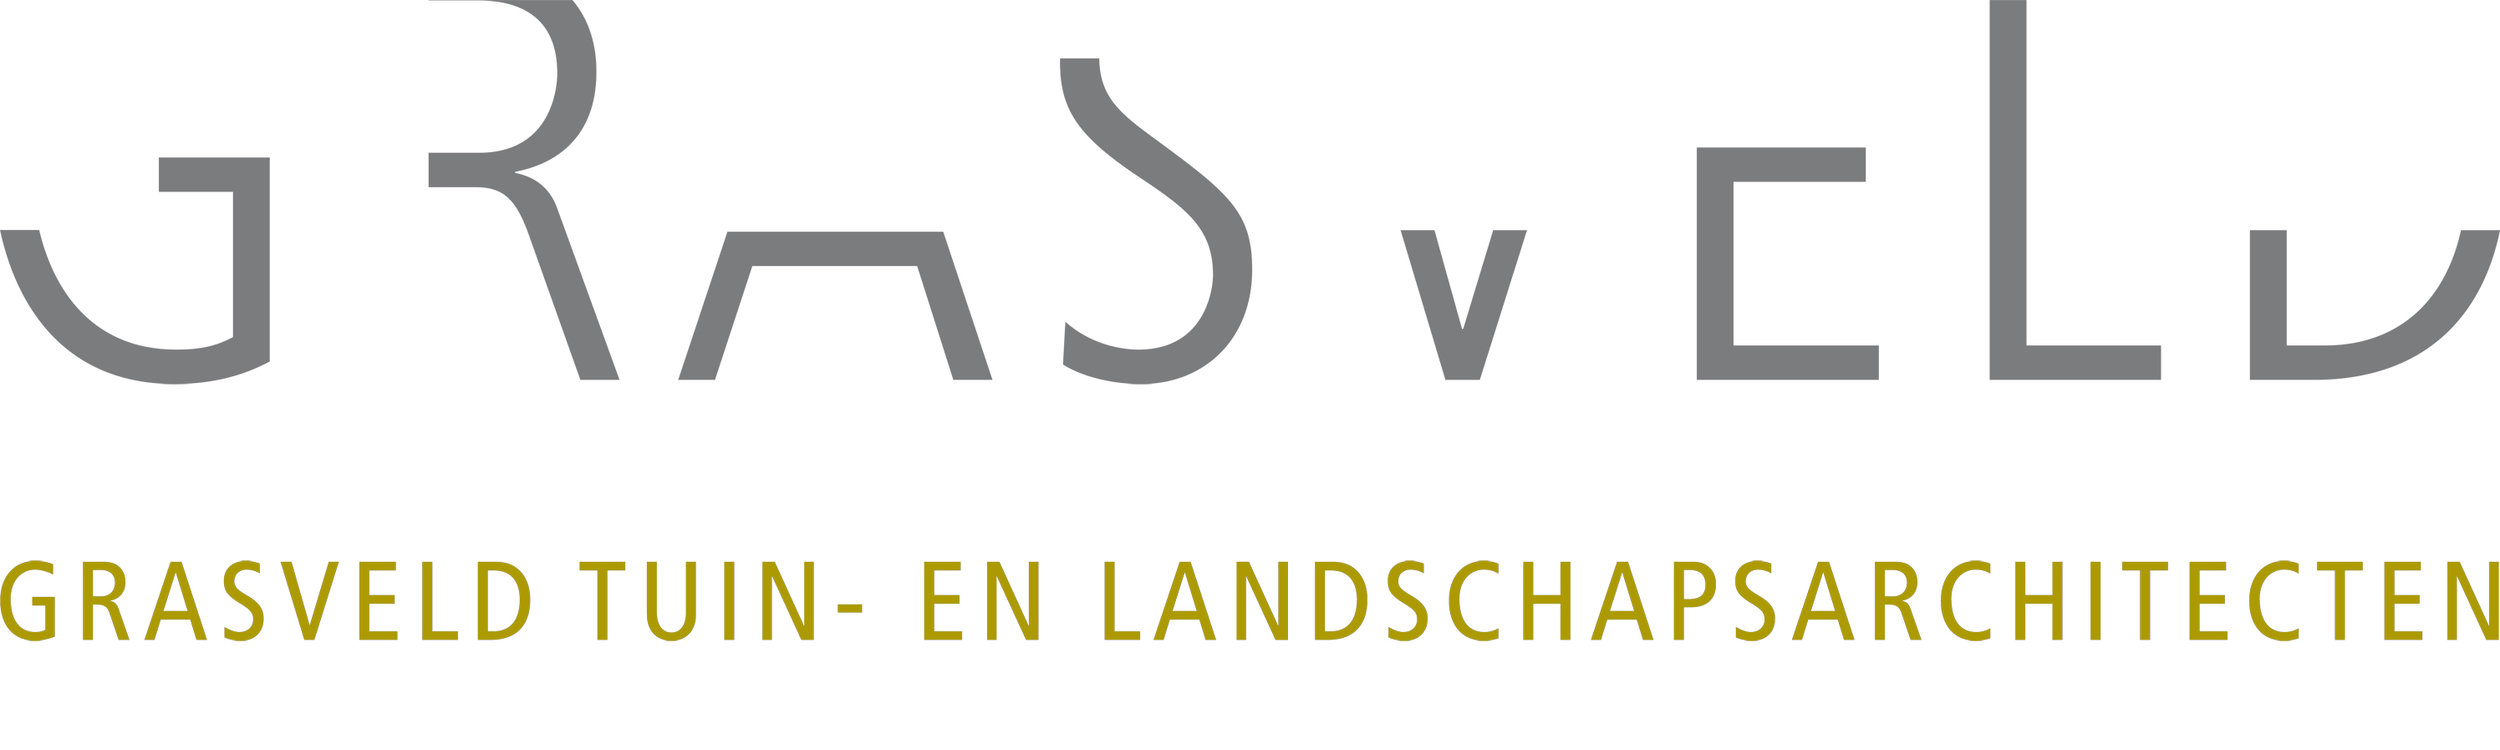 GRASVELD Tuin- en Landschapsarchitecten logo